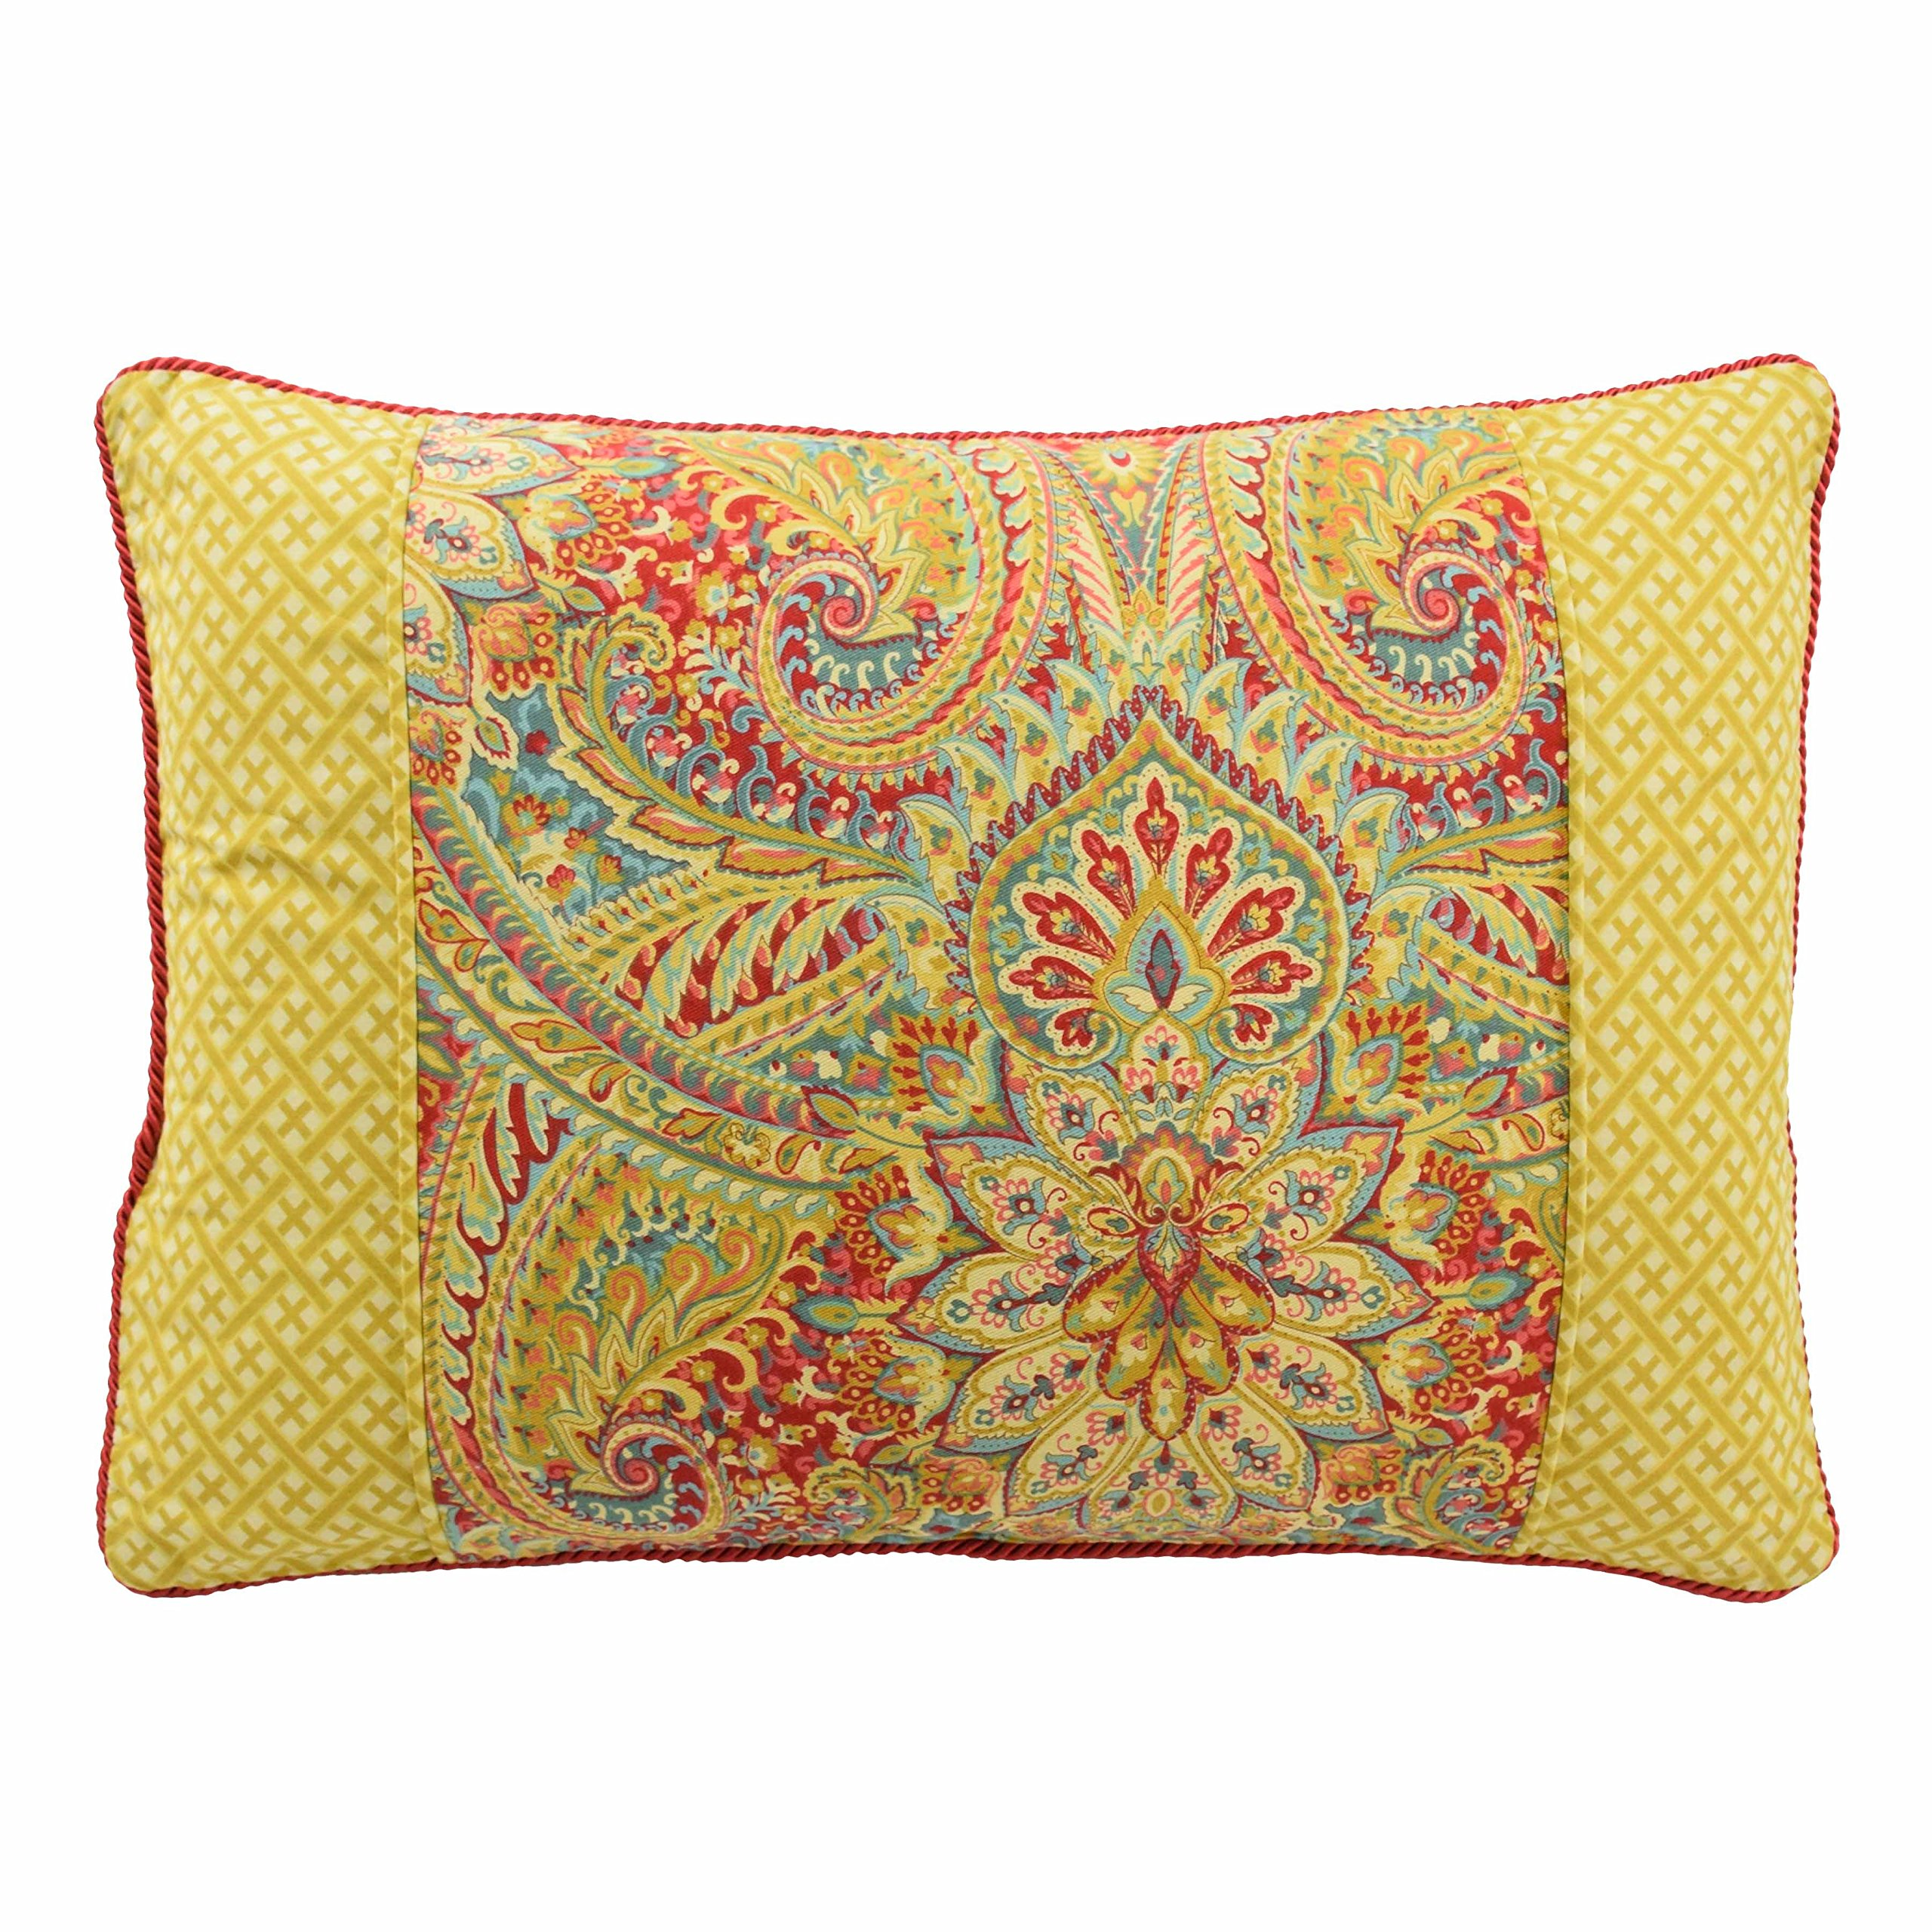 WAVERLY Swept Away Decorative Pillow, 14''x20'', Berry